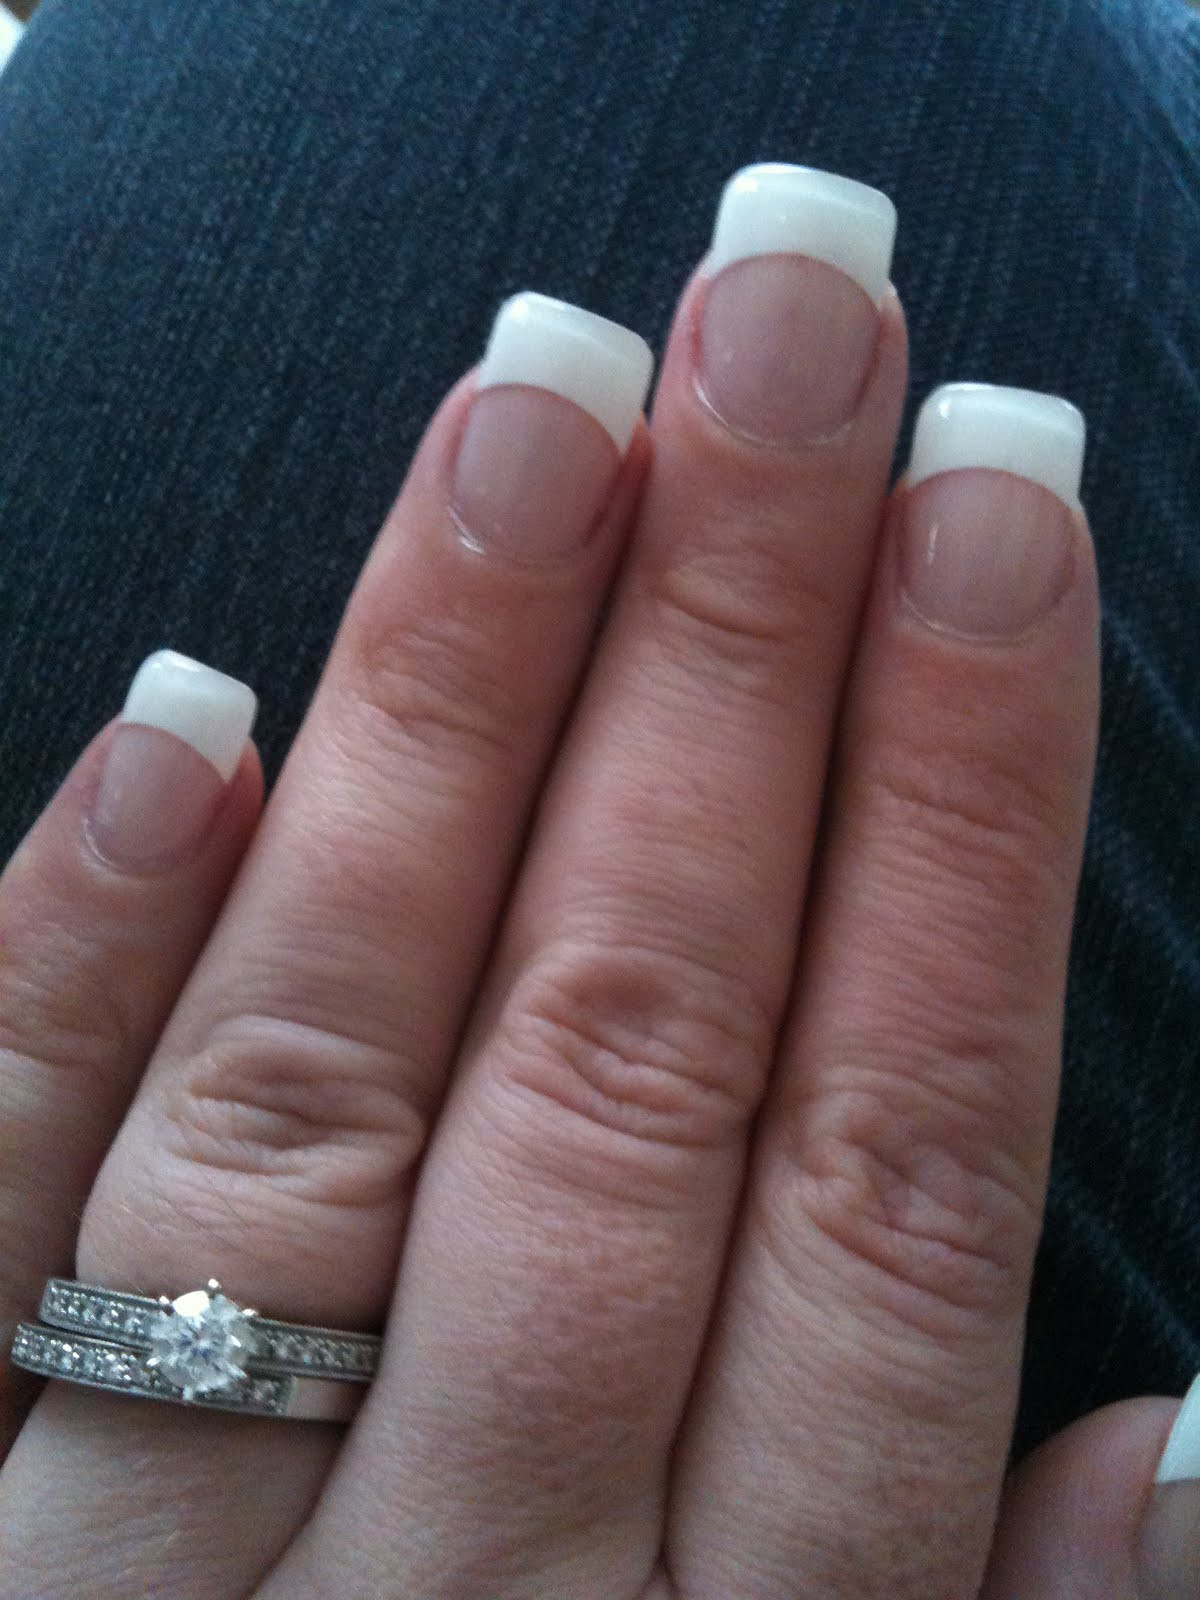 Maniküre Gel  MsSparkleArkle French Manicure with Gel Nails